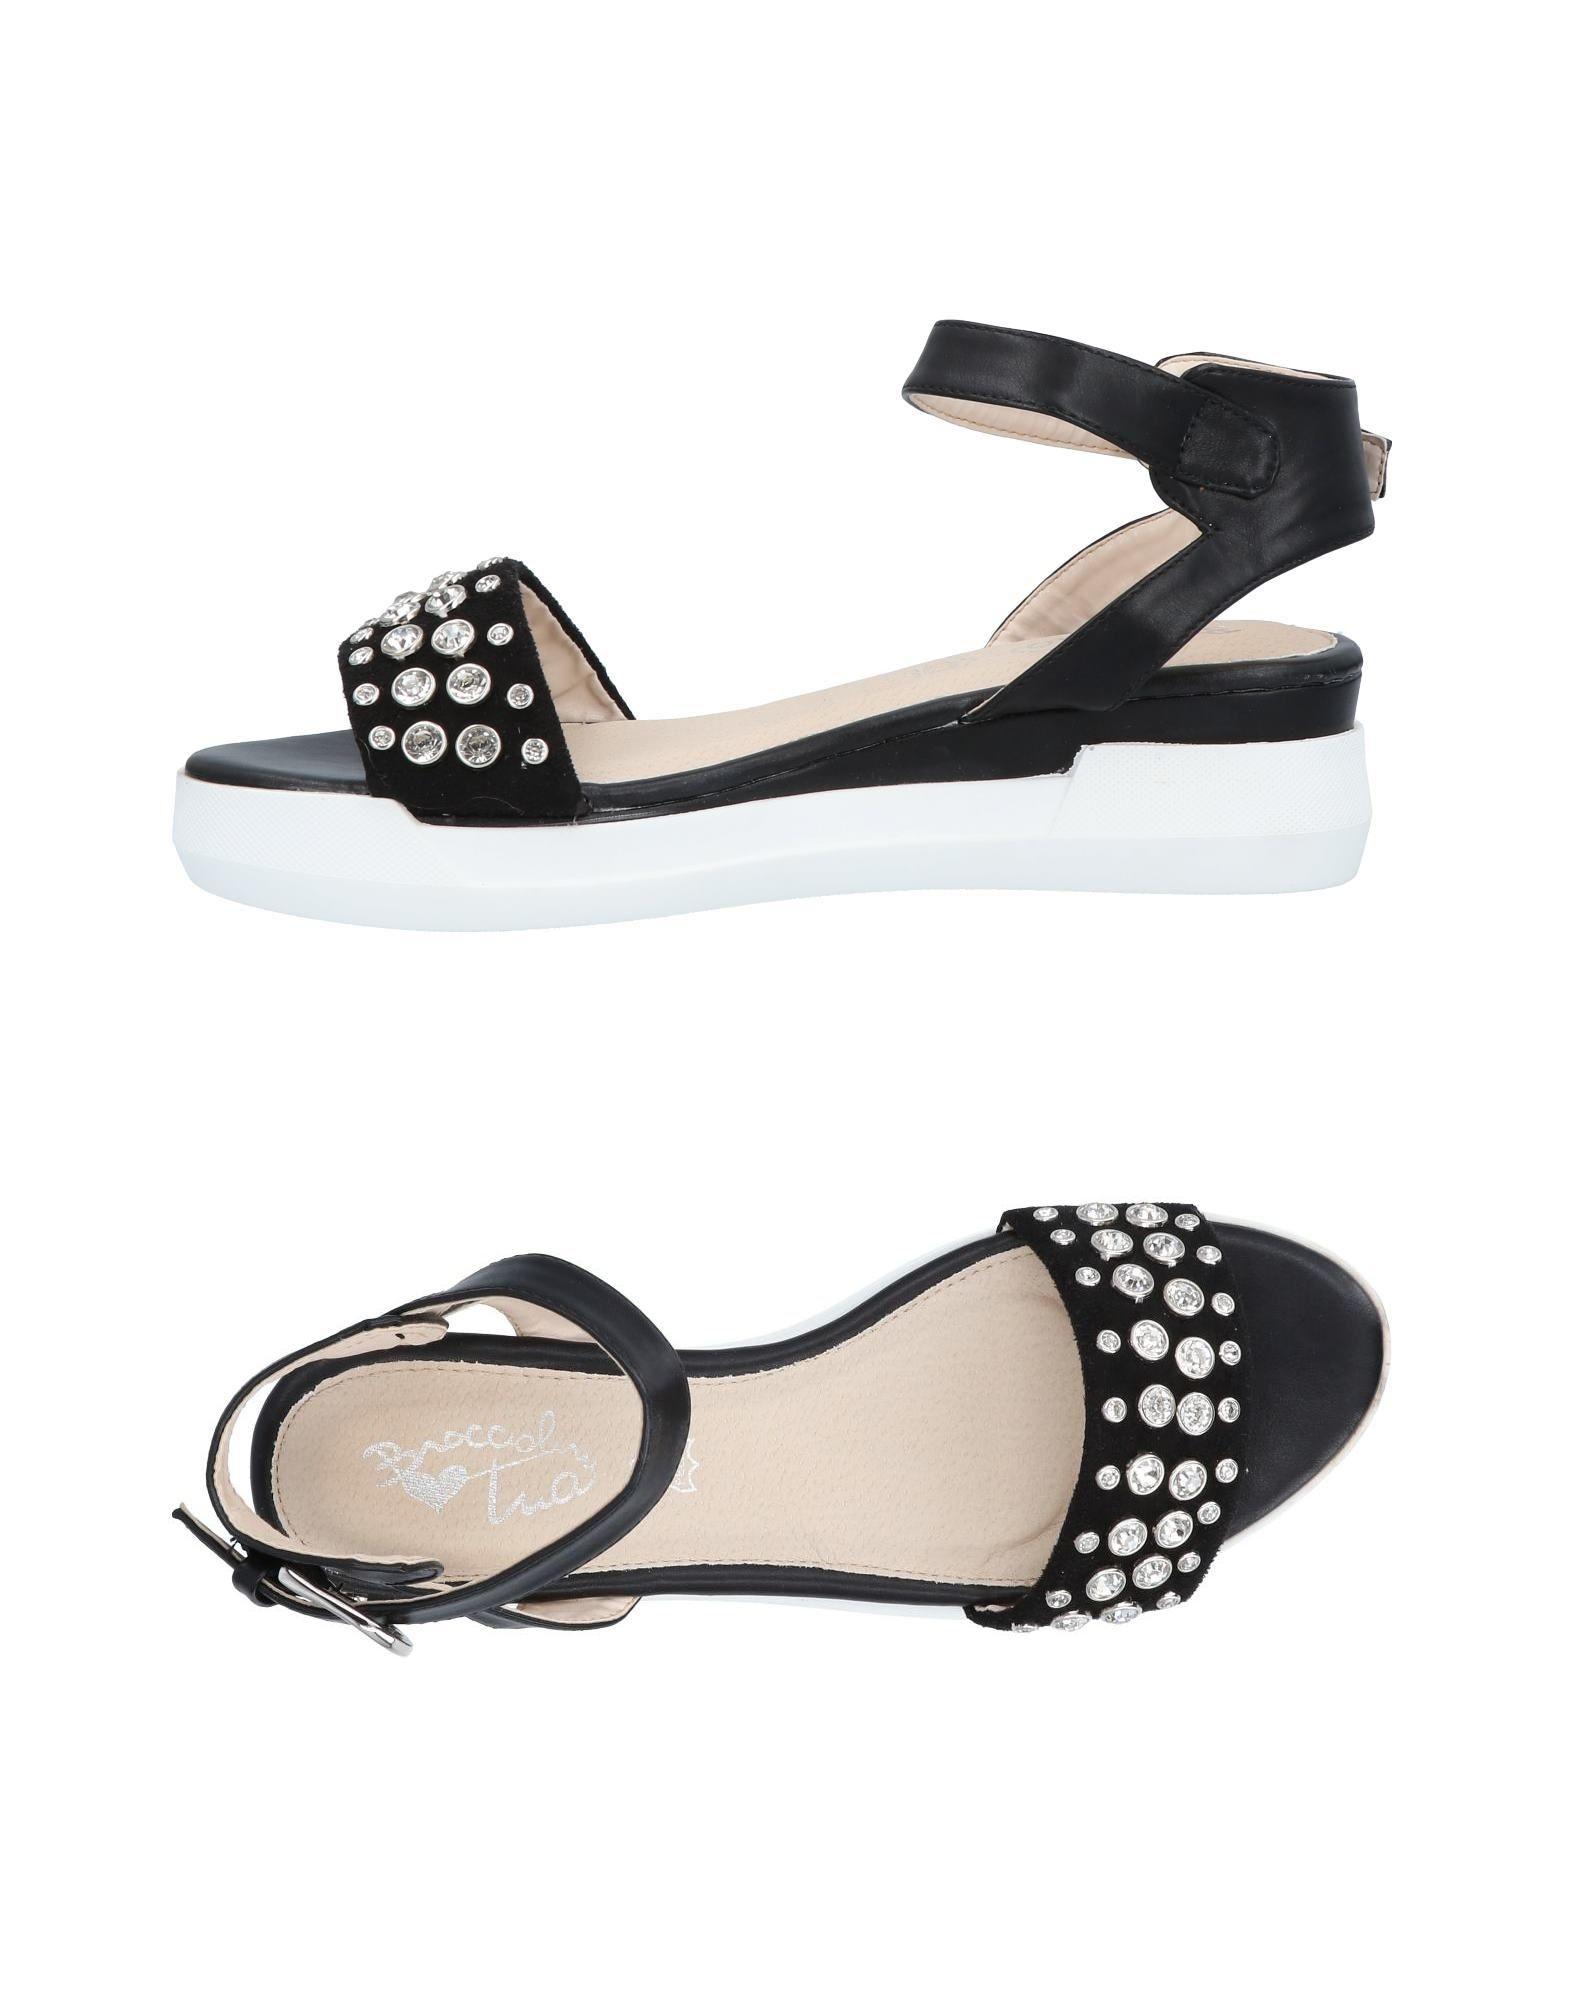 Tua By Braccialini Sandalen Damen  11449046DT Gute Qualität Qualität Gute beliebte Schuhe 3b0523